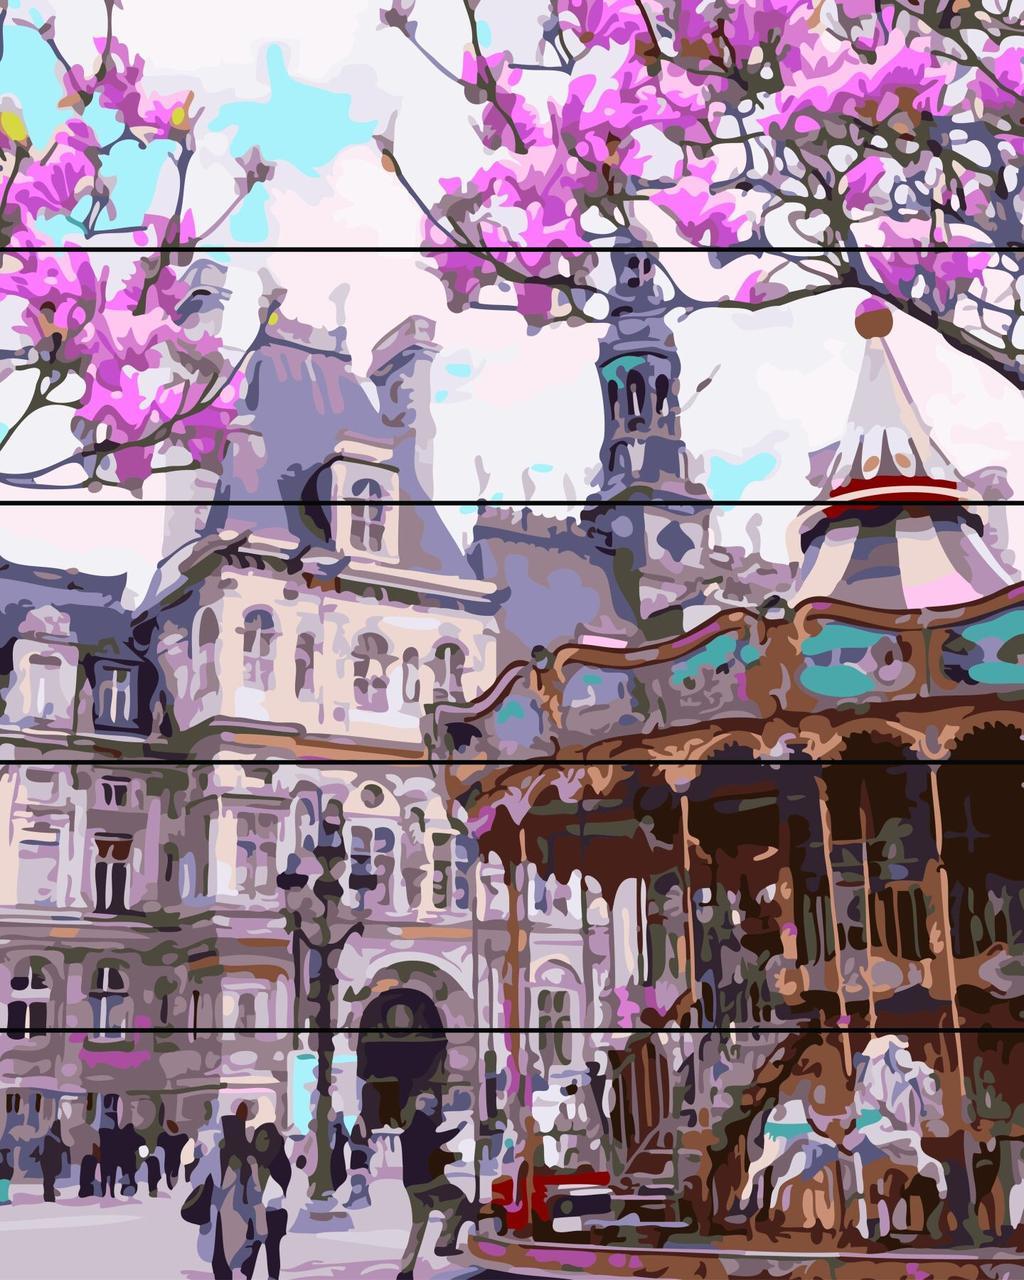 Живопись по номерам на дереве Площадь в Праге Rainbow Art RA-AS0147 40 х 50 см